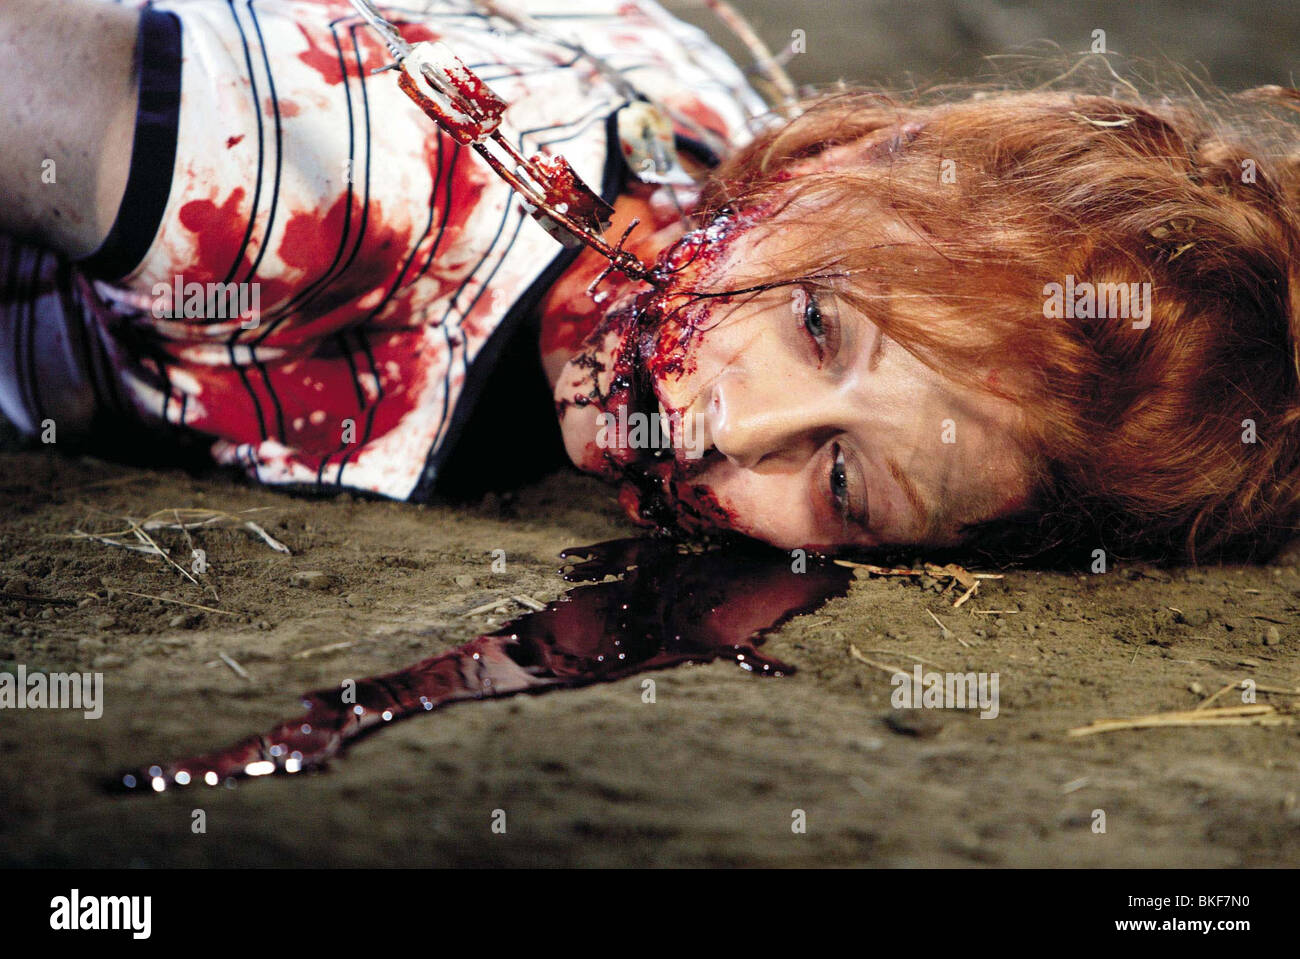 Erreur -2003 Photo Stock